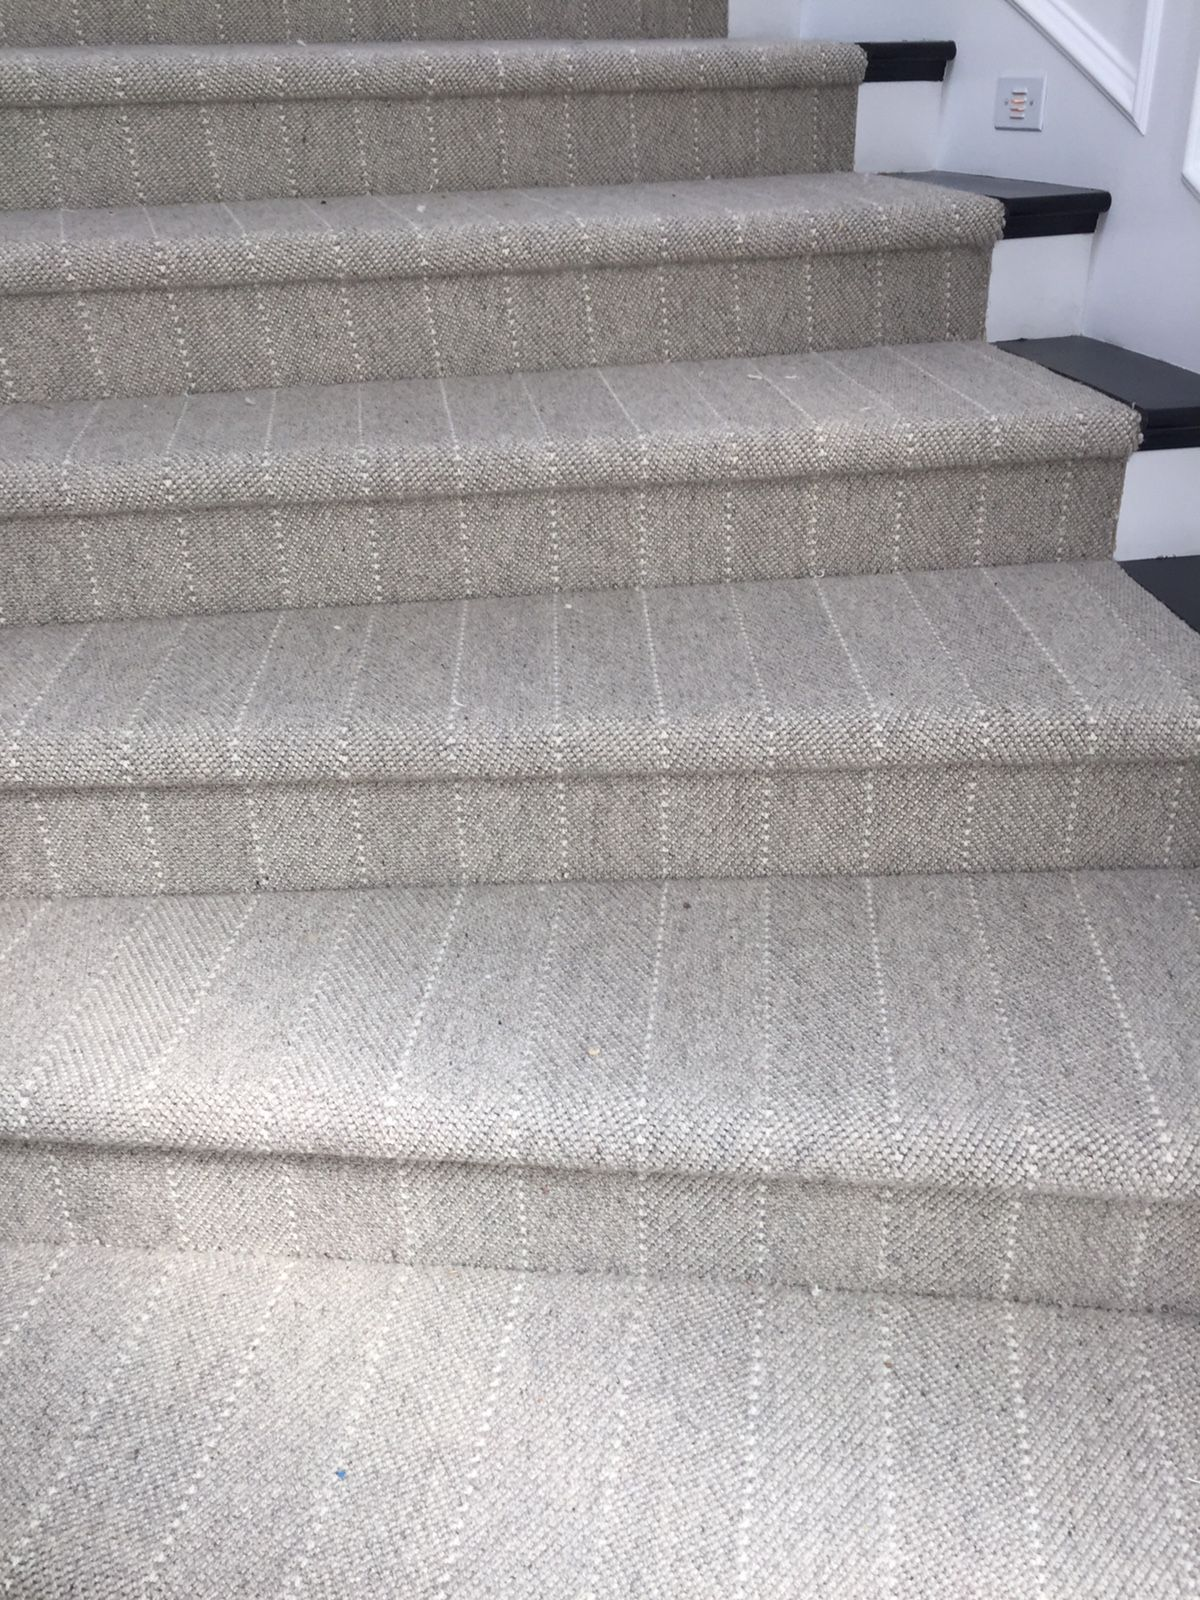 Neutral Stripe Stair Runner Striped Stair Runner Carpet Stairs | Modern Carpet Runners For Stairs | Geometric | Design | White | Curved | Kitchen Modern